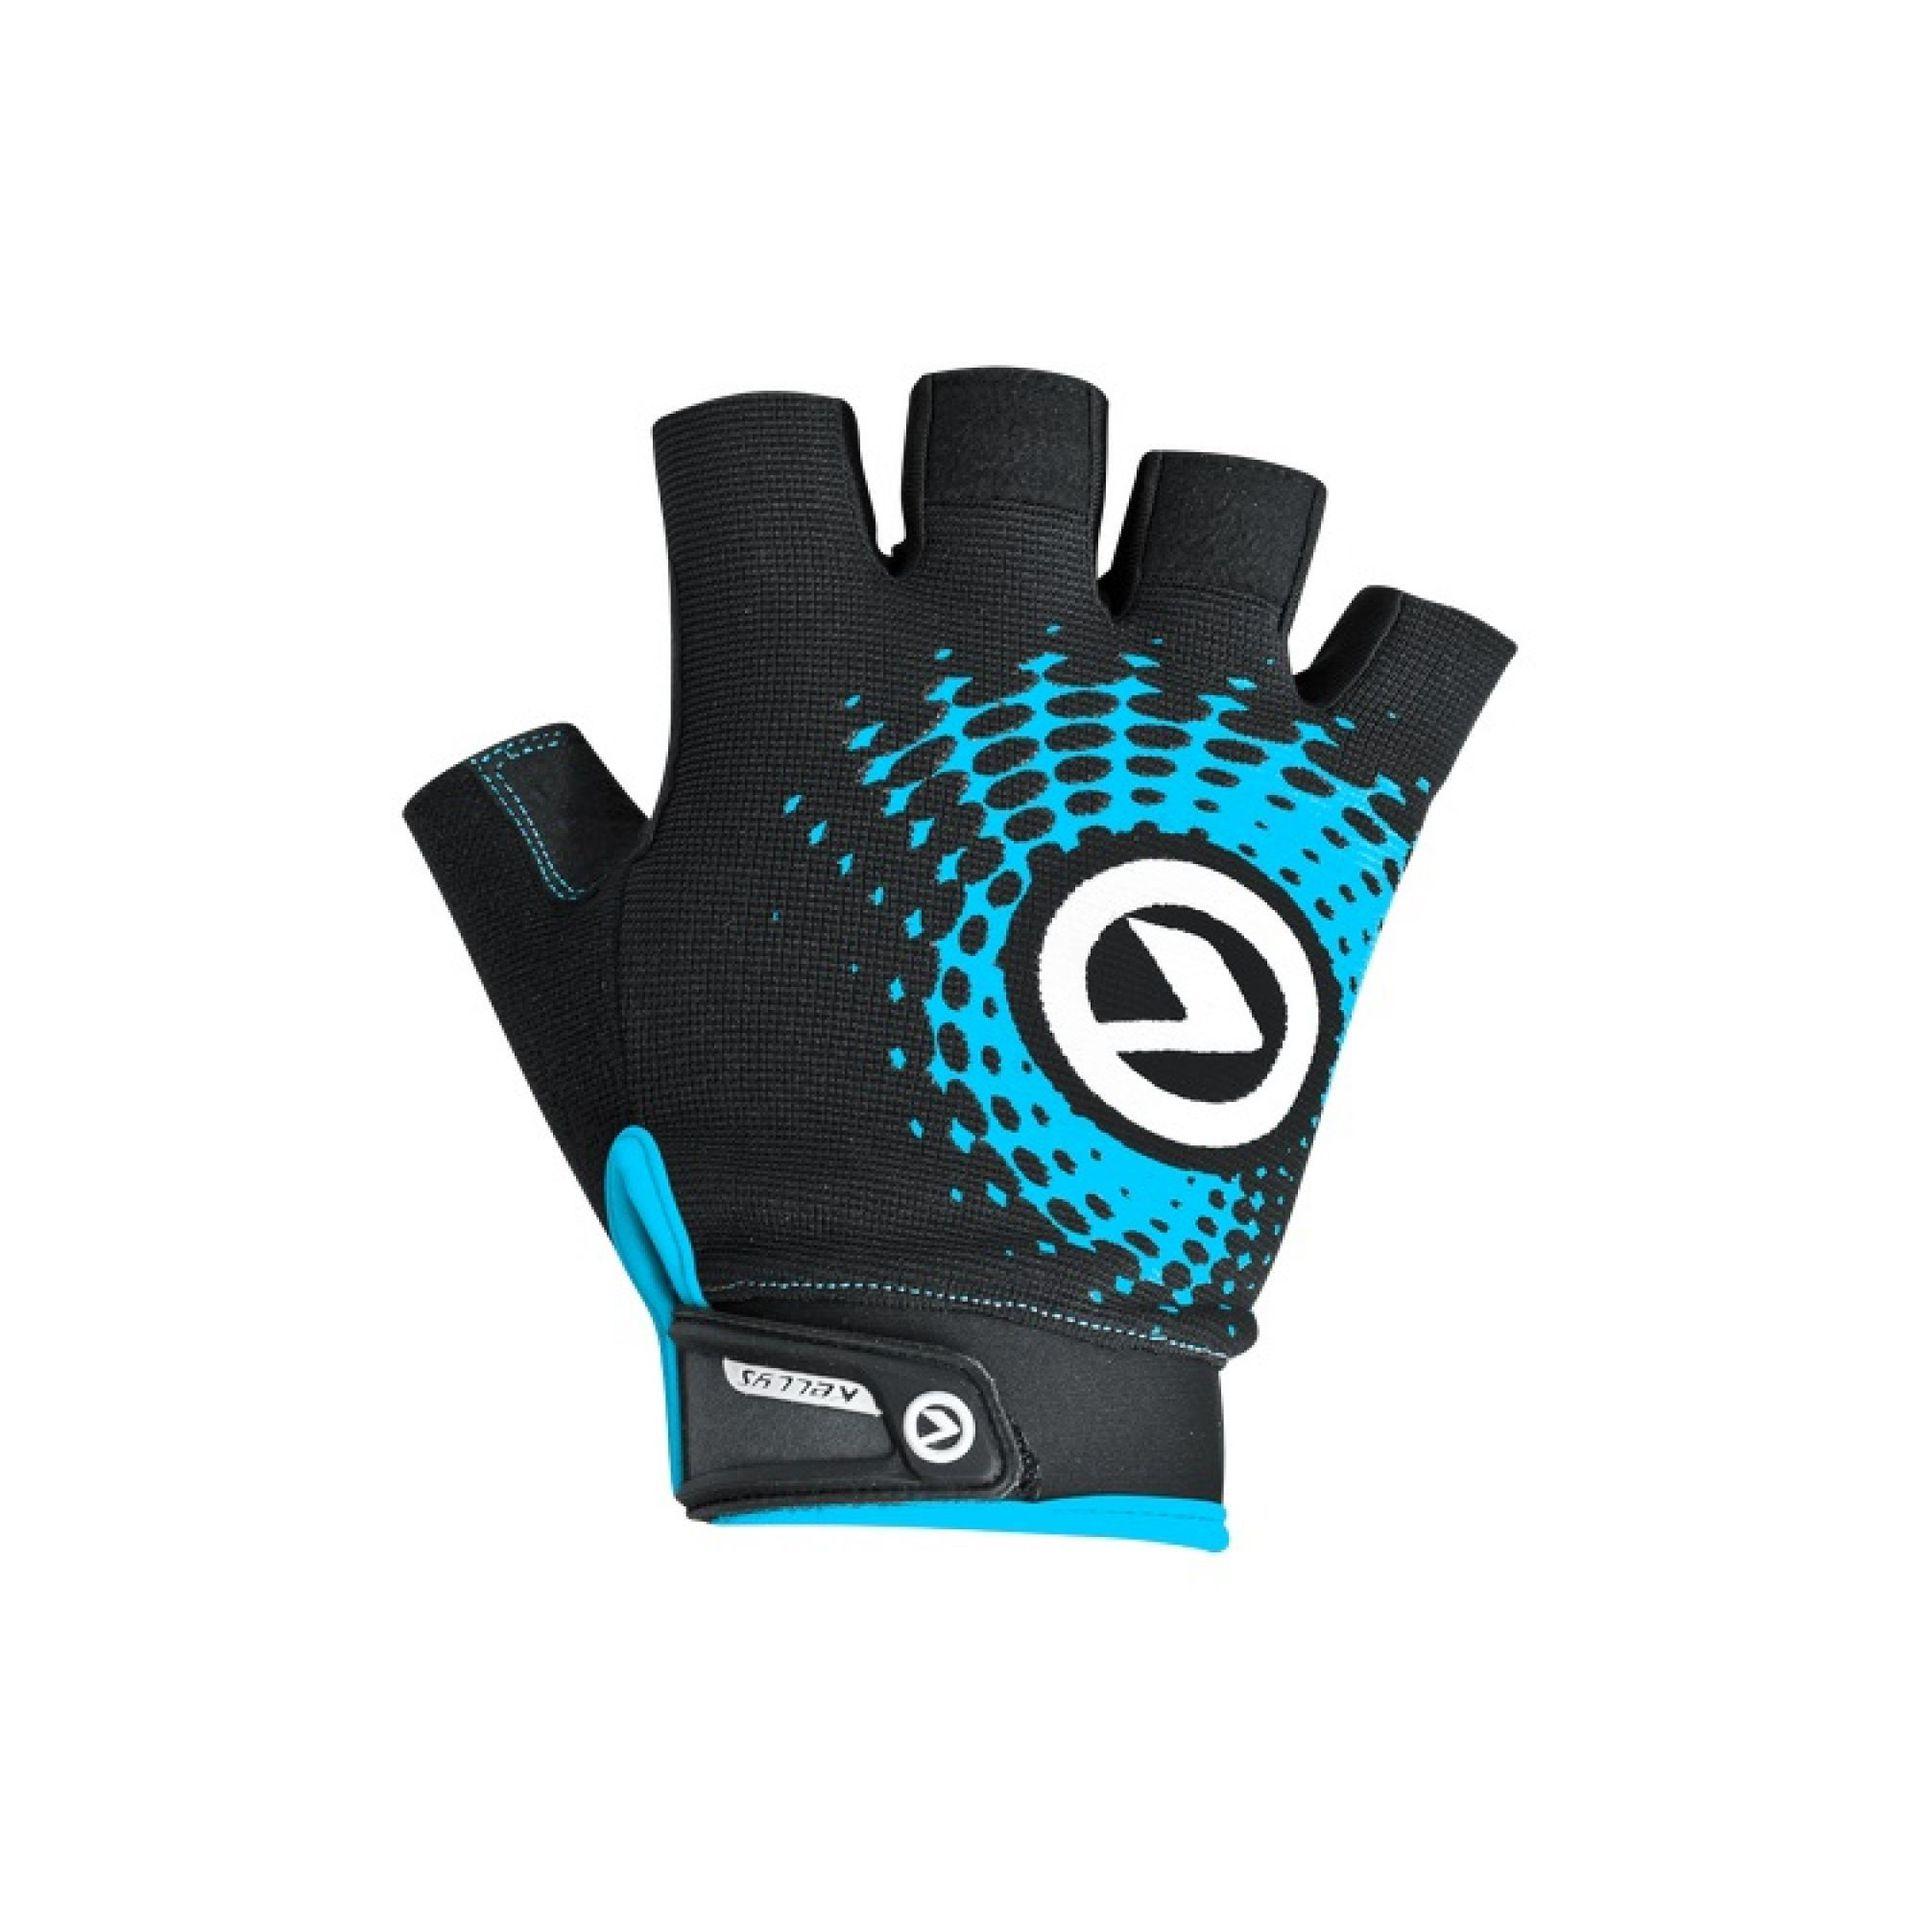 Rękawiczki rowerowe Kellys Impact Short czarne|niebieskie